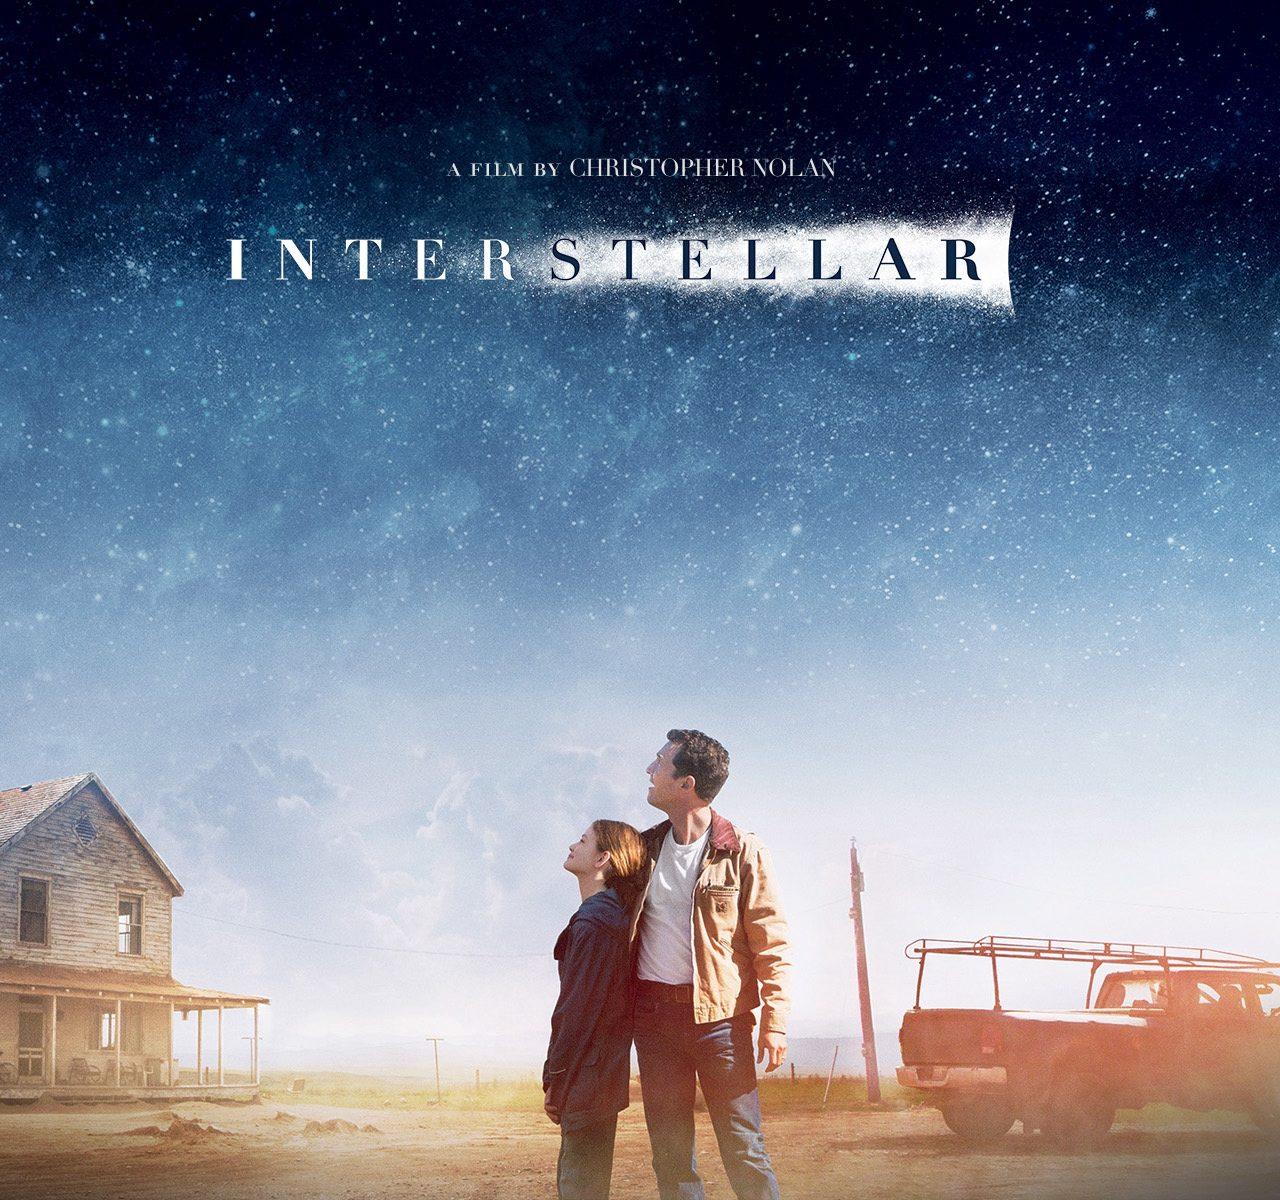 Anne Hathaway And Matthew Mcconaughey Movies: Interstellar Matthew Mcconaughey Anne Hathaway Desktop